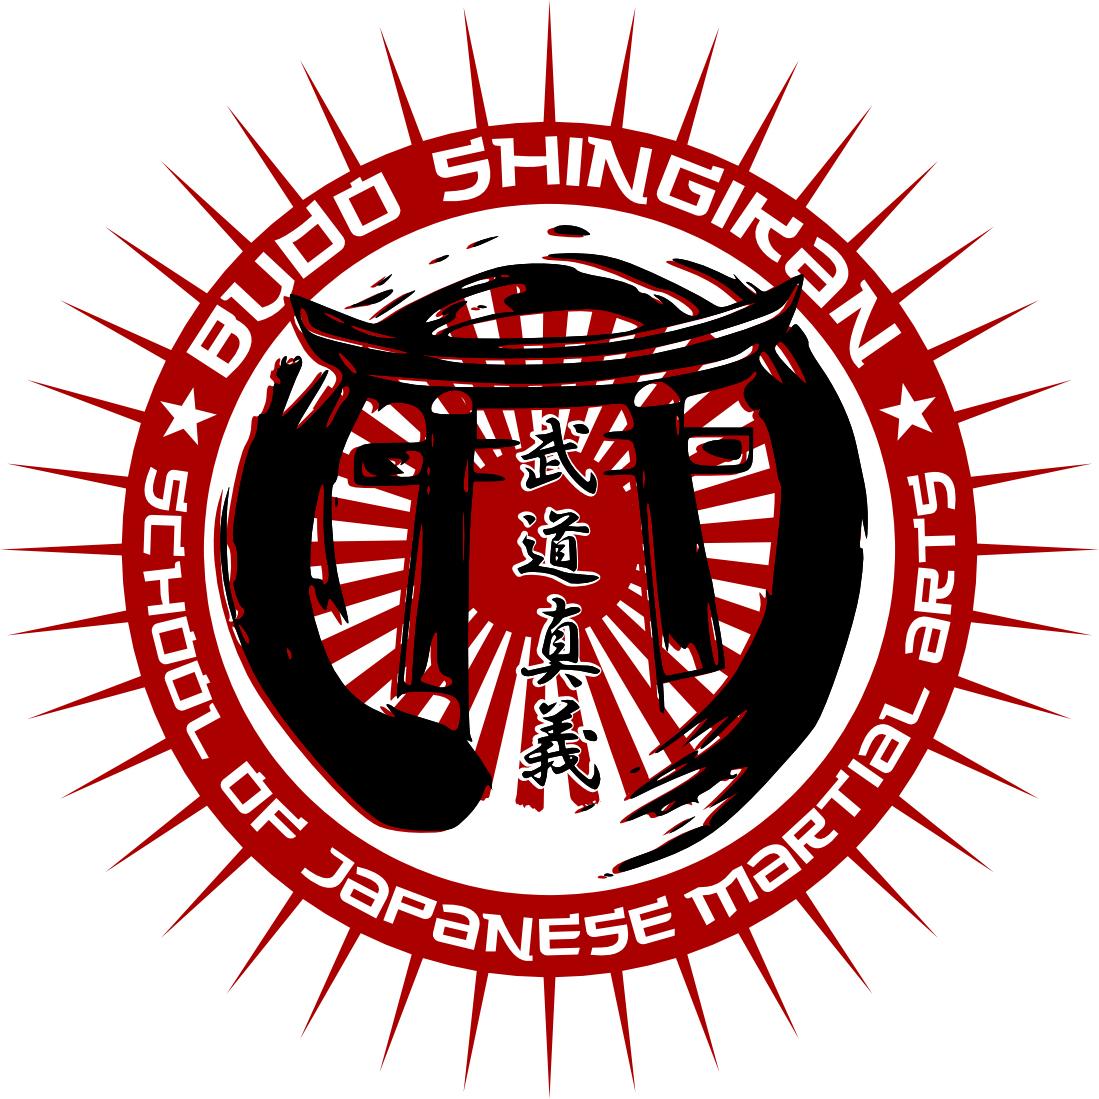 Budo Shingikan Logo